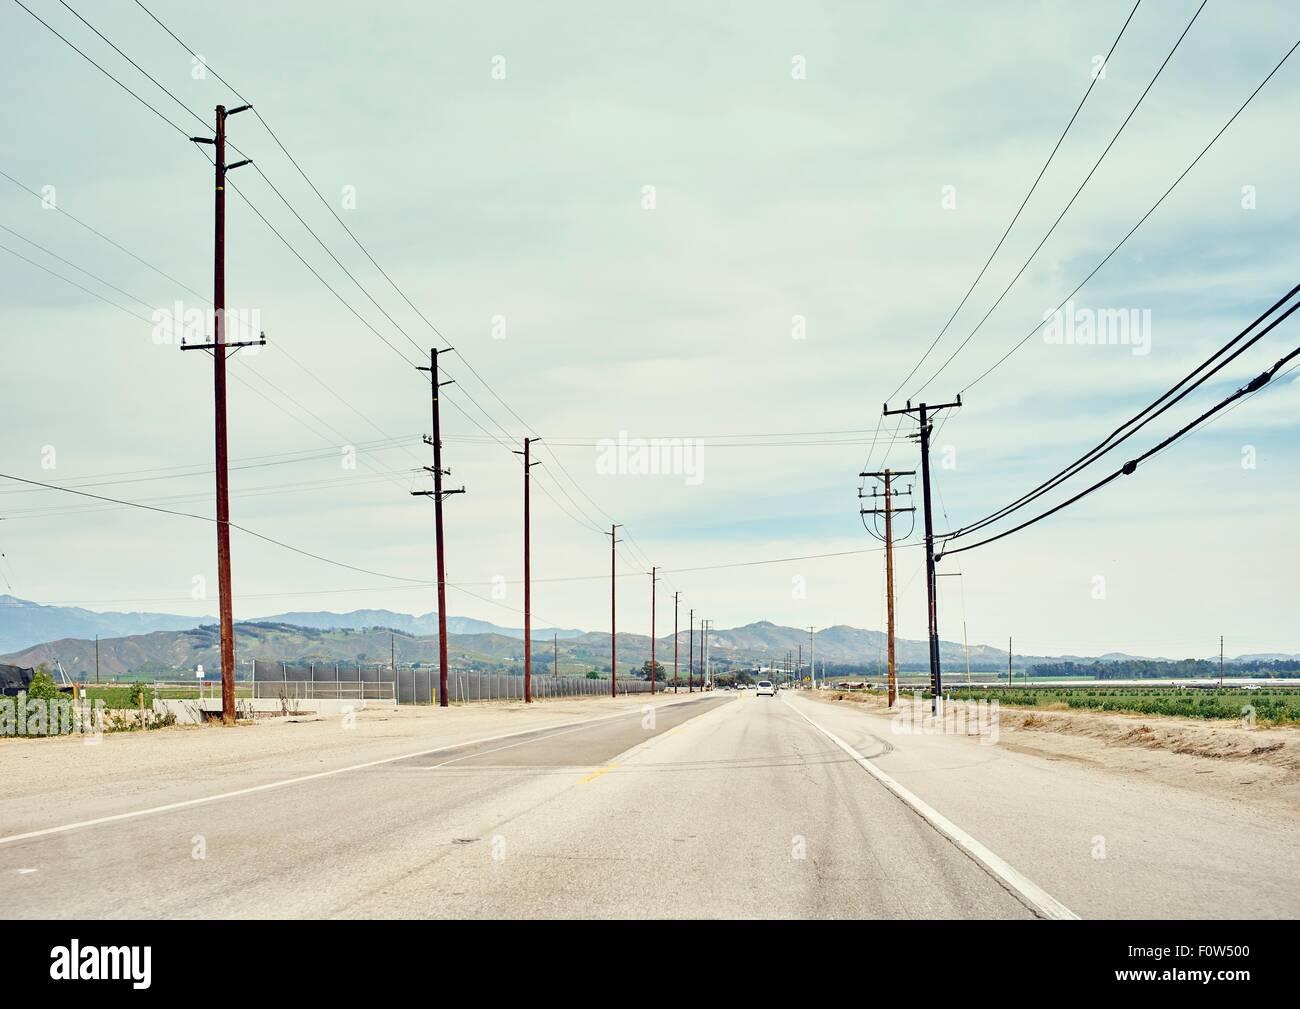 Sides Stockfotos & Sides Bilder - Alamy